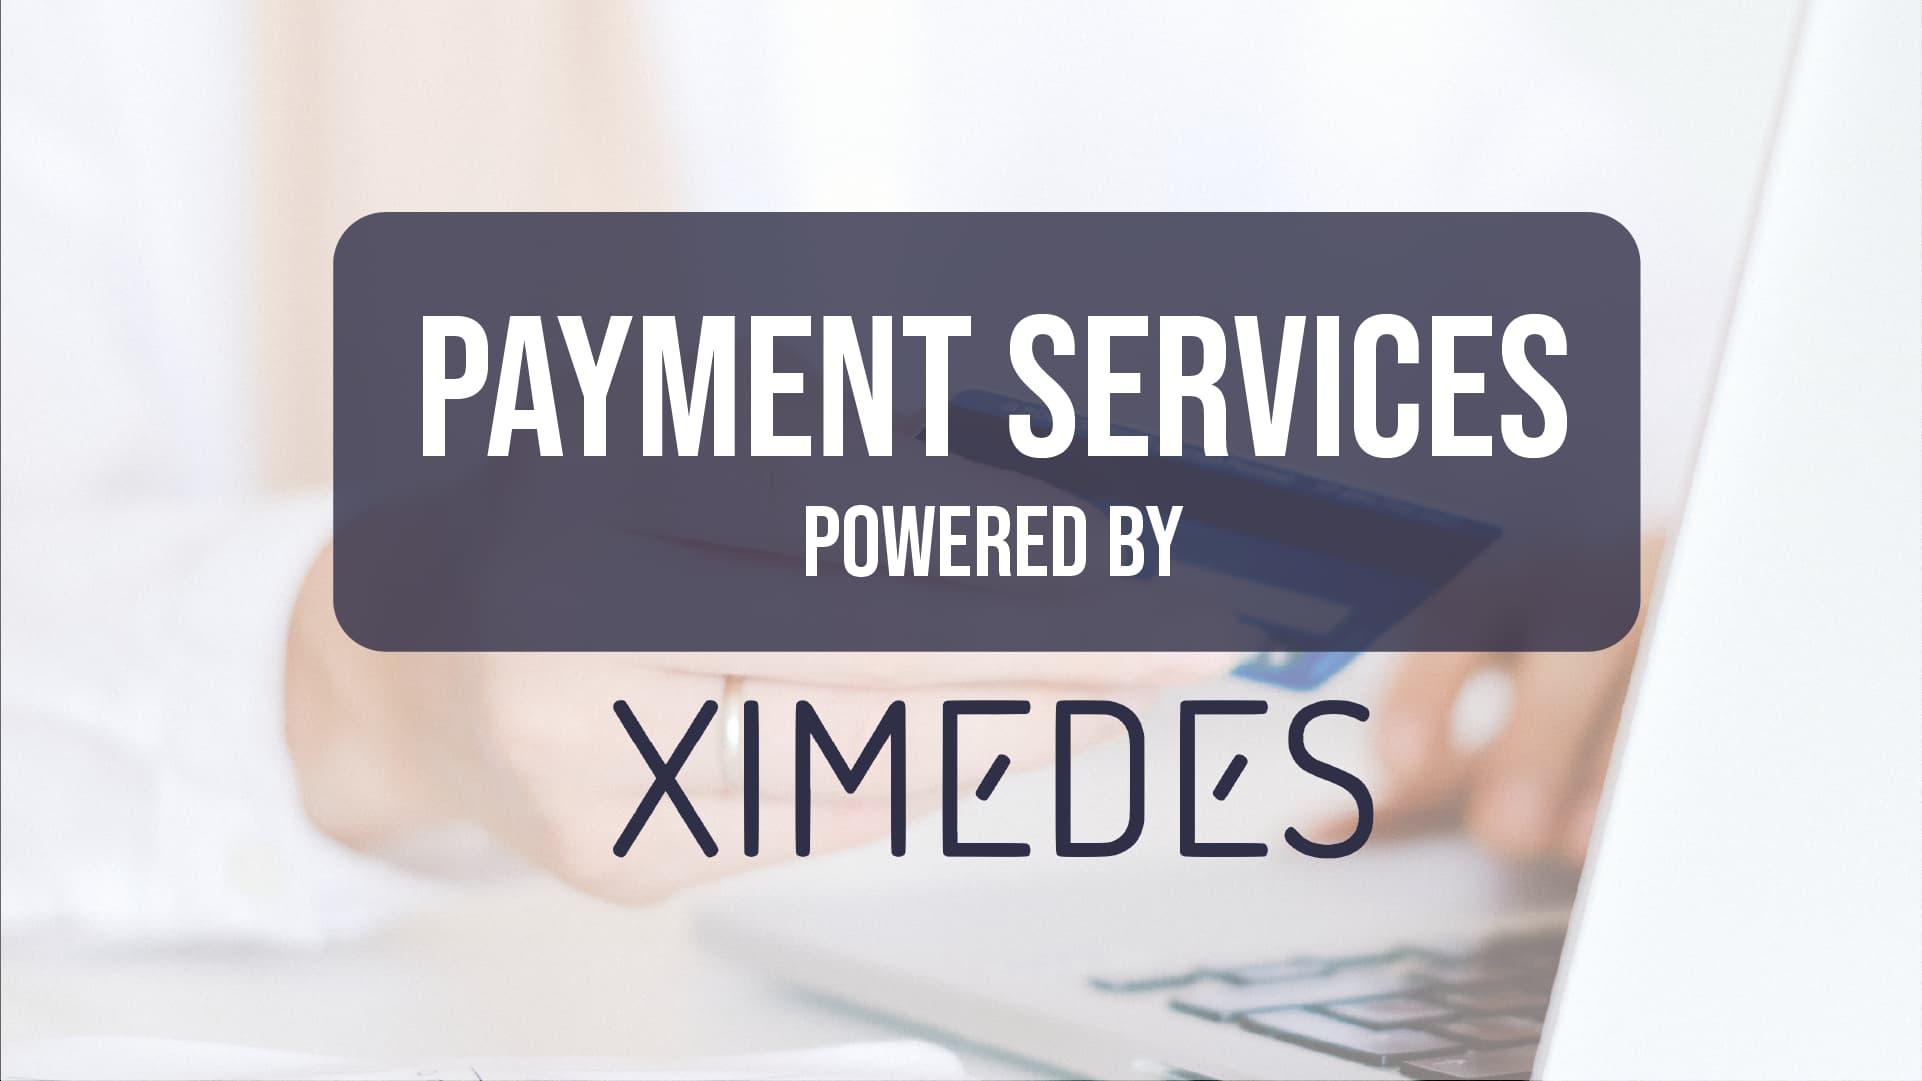 payments services ximedees fintech magazine